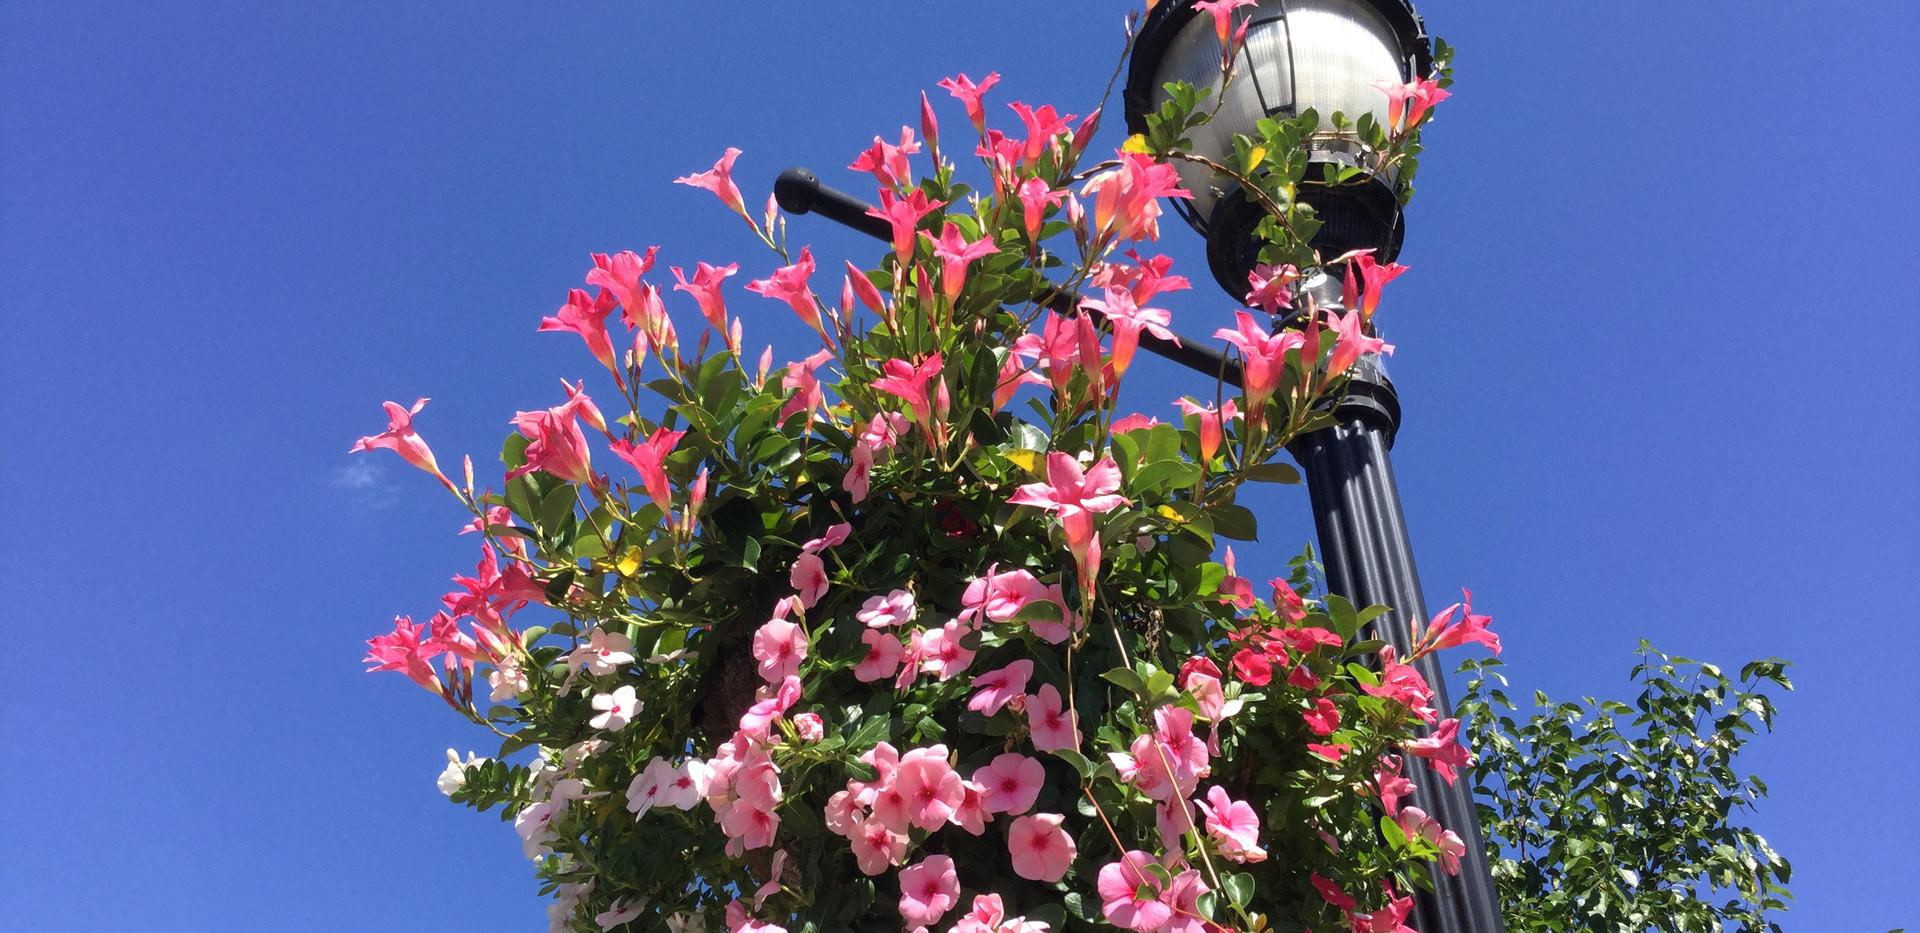 Greensboro Flower Pots